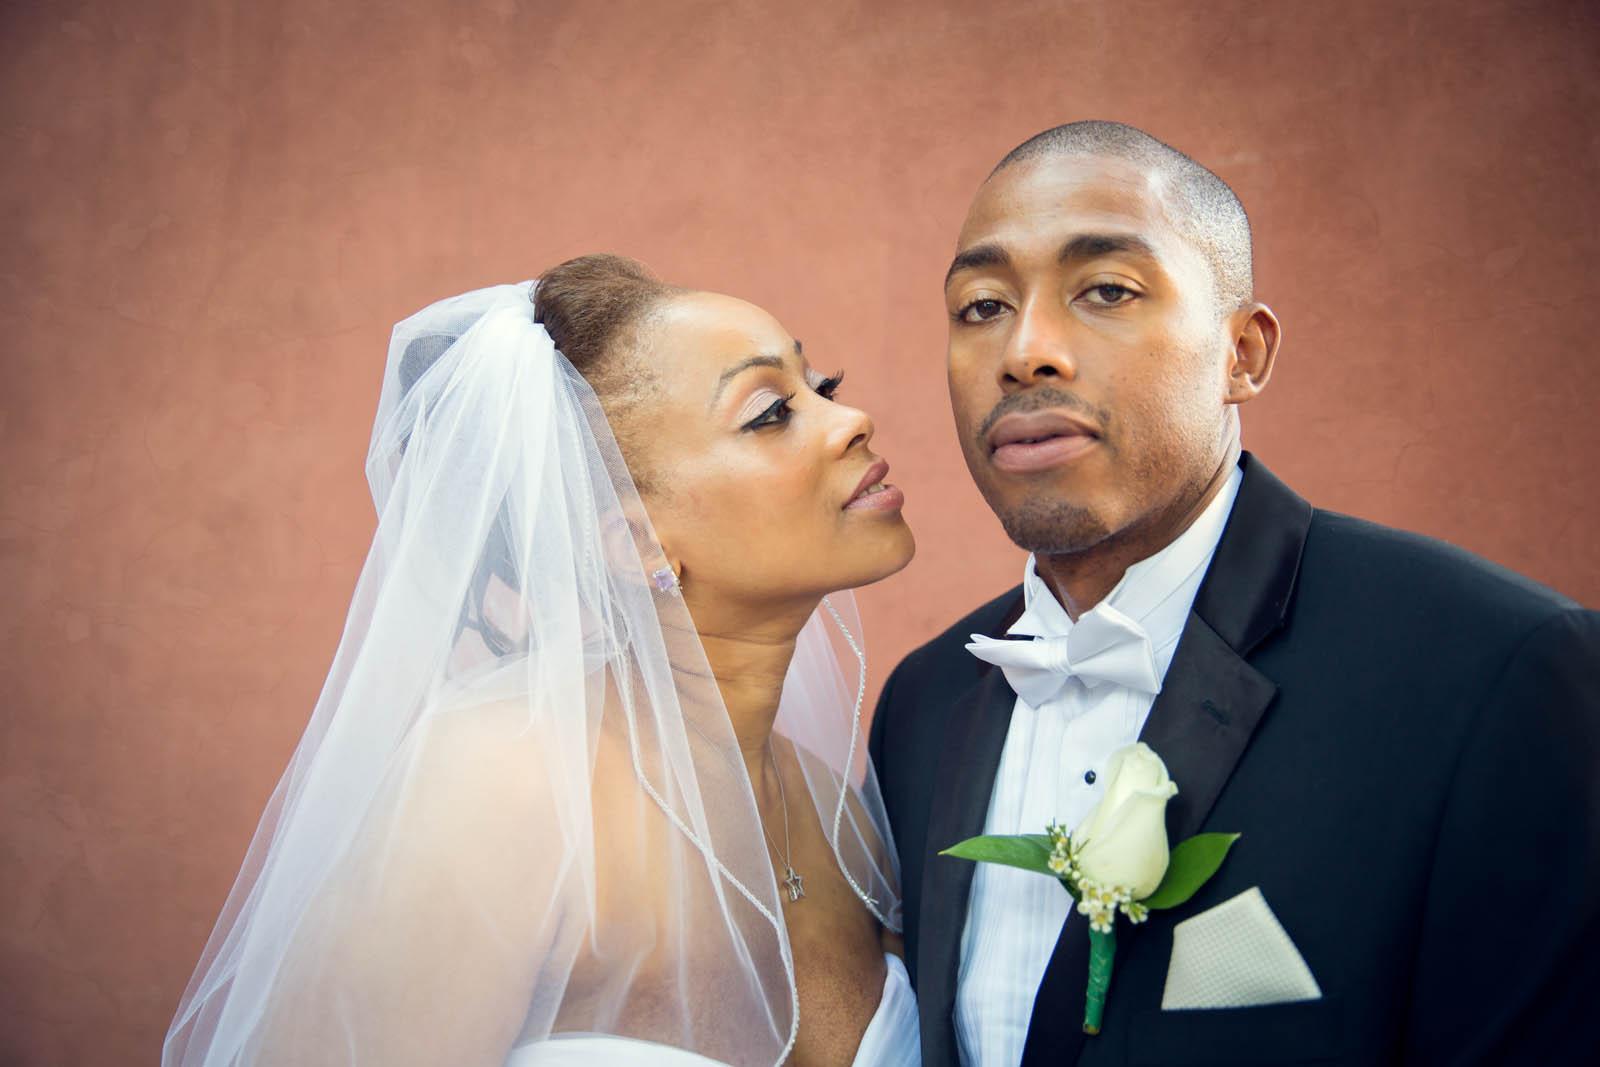 Malik_and_Shanika_Wedding_Ernestosue-9115-Edit.jpg